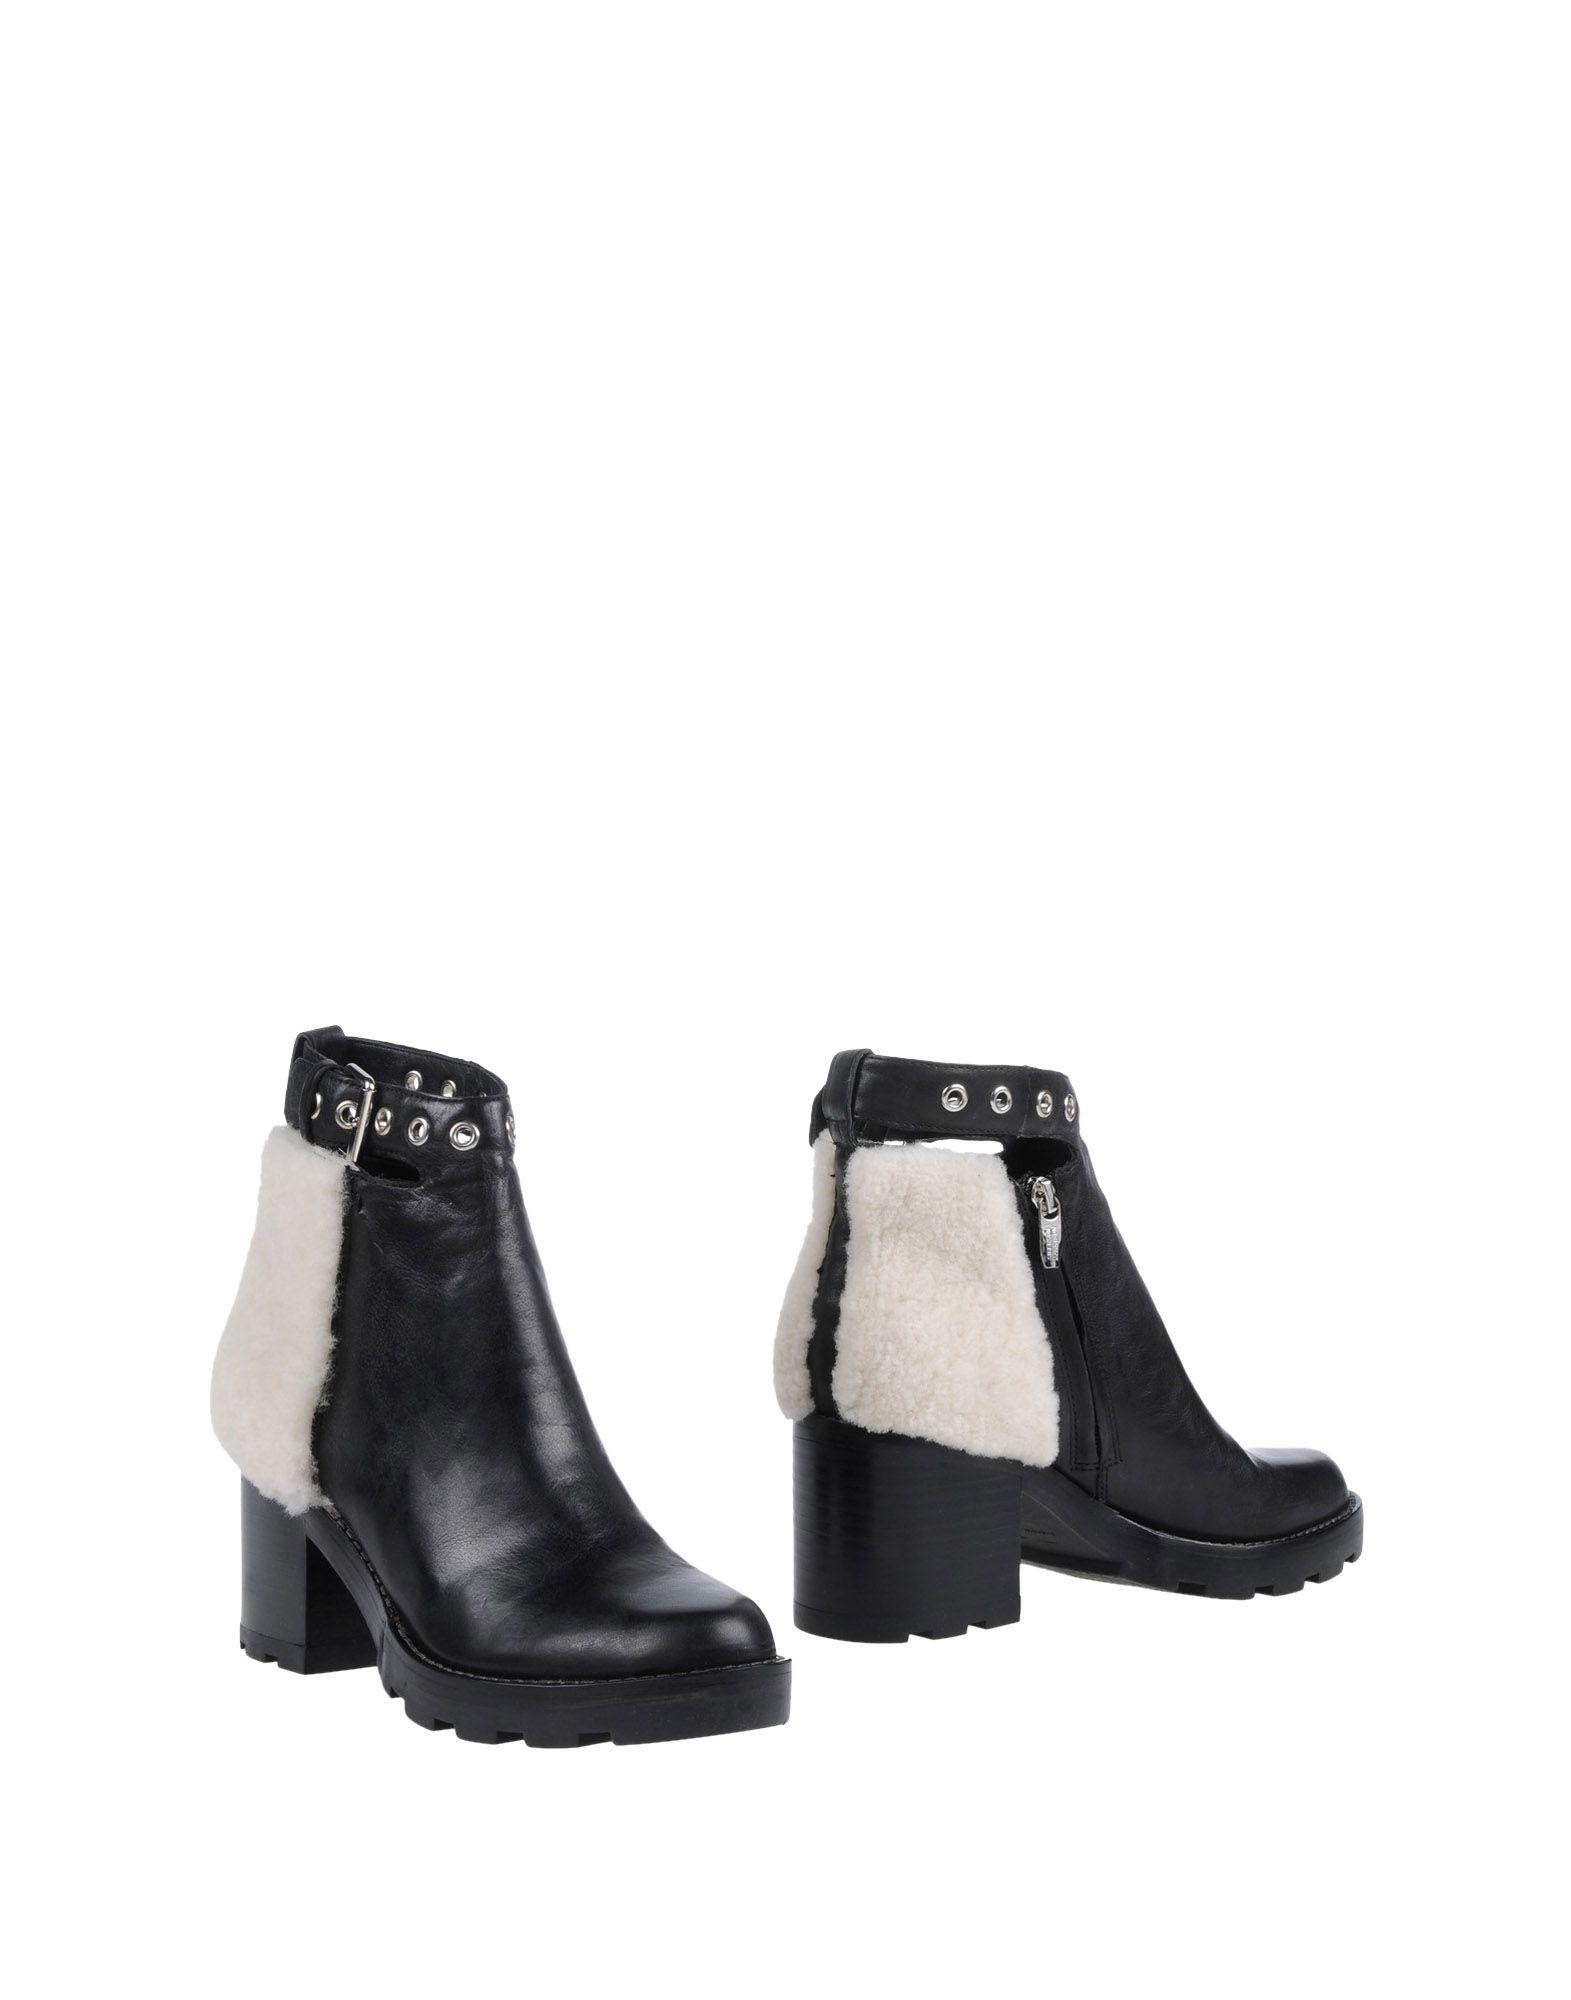 Sigerson Morrison Stiefelette Damen  11452742GQGut Schuhe aussehende strapazierfähige Schuhe 11452742GQGut 8e392e